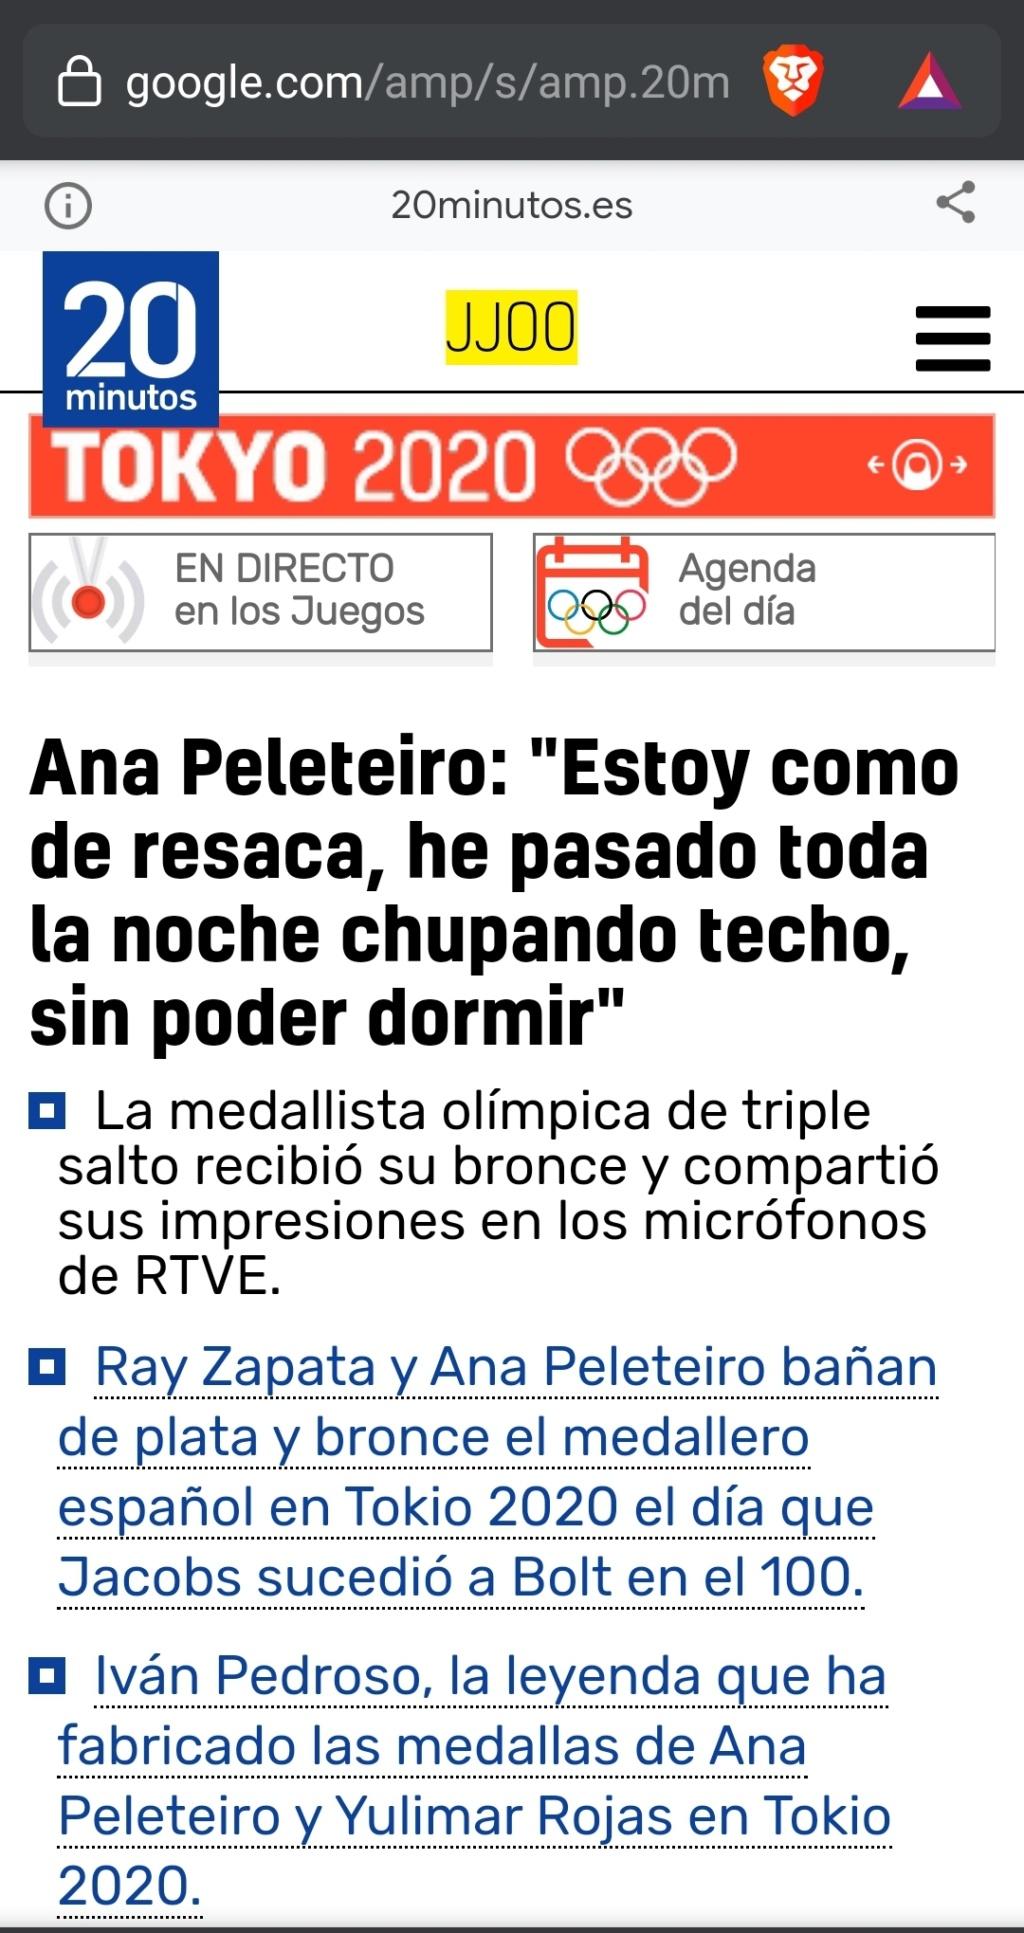 Juegos Olímpicos Tokio 2020  - Página 3 Scree211